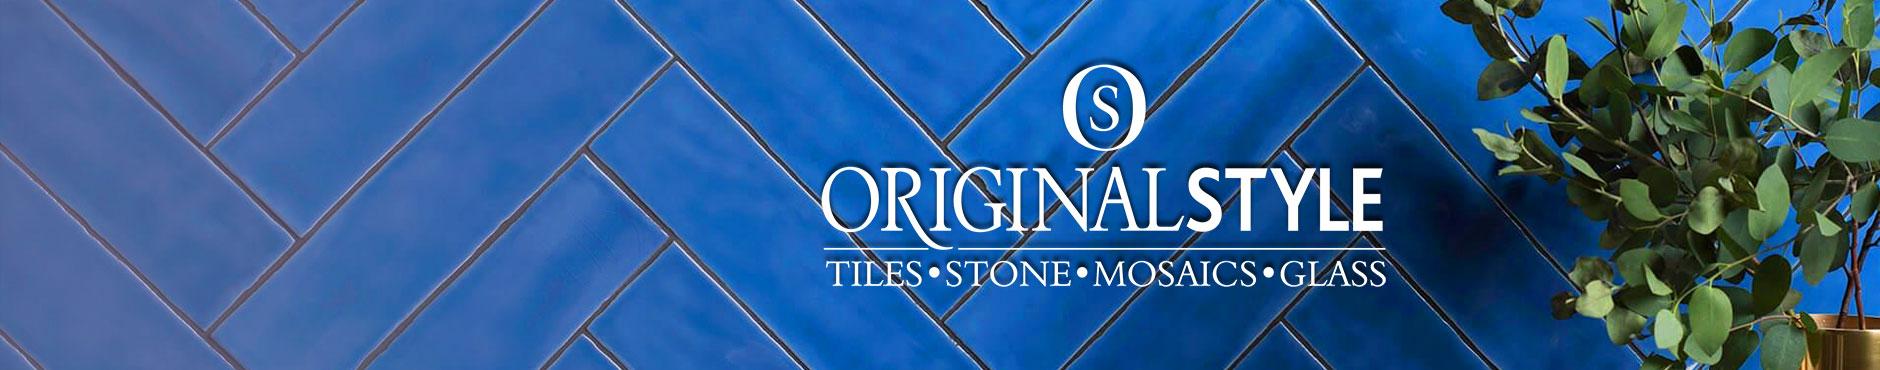 Original Style 20% Off Sale August 2018